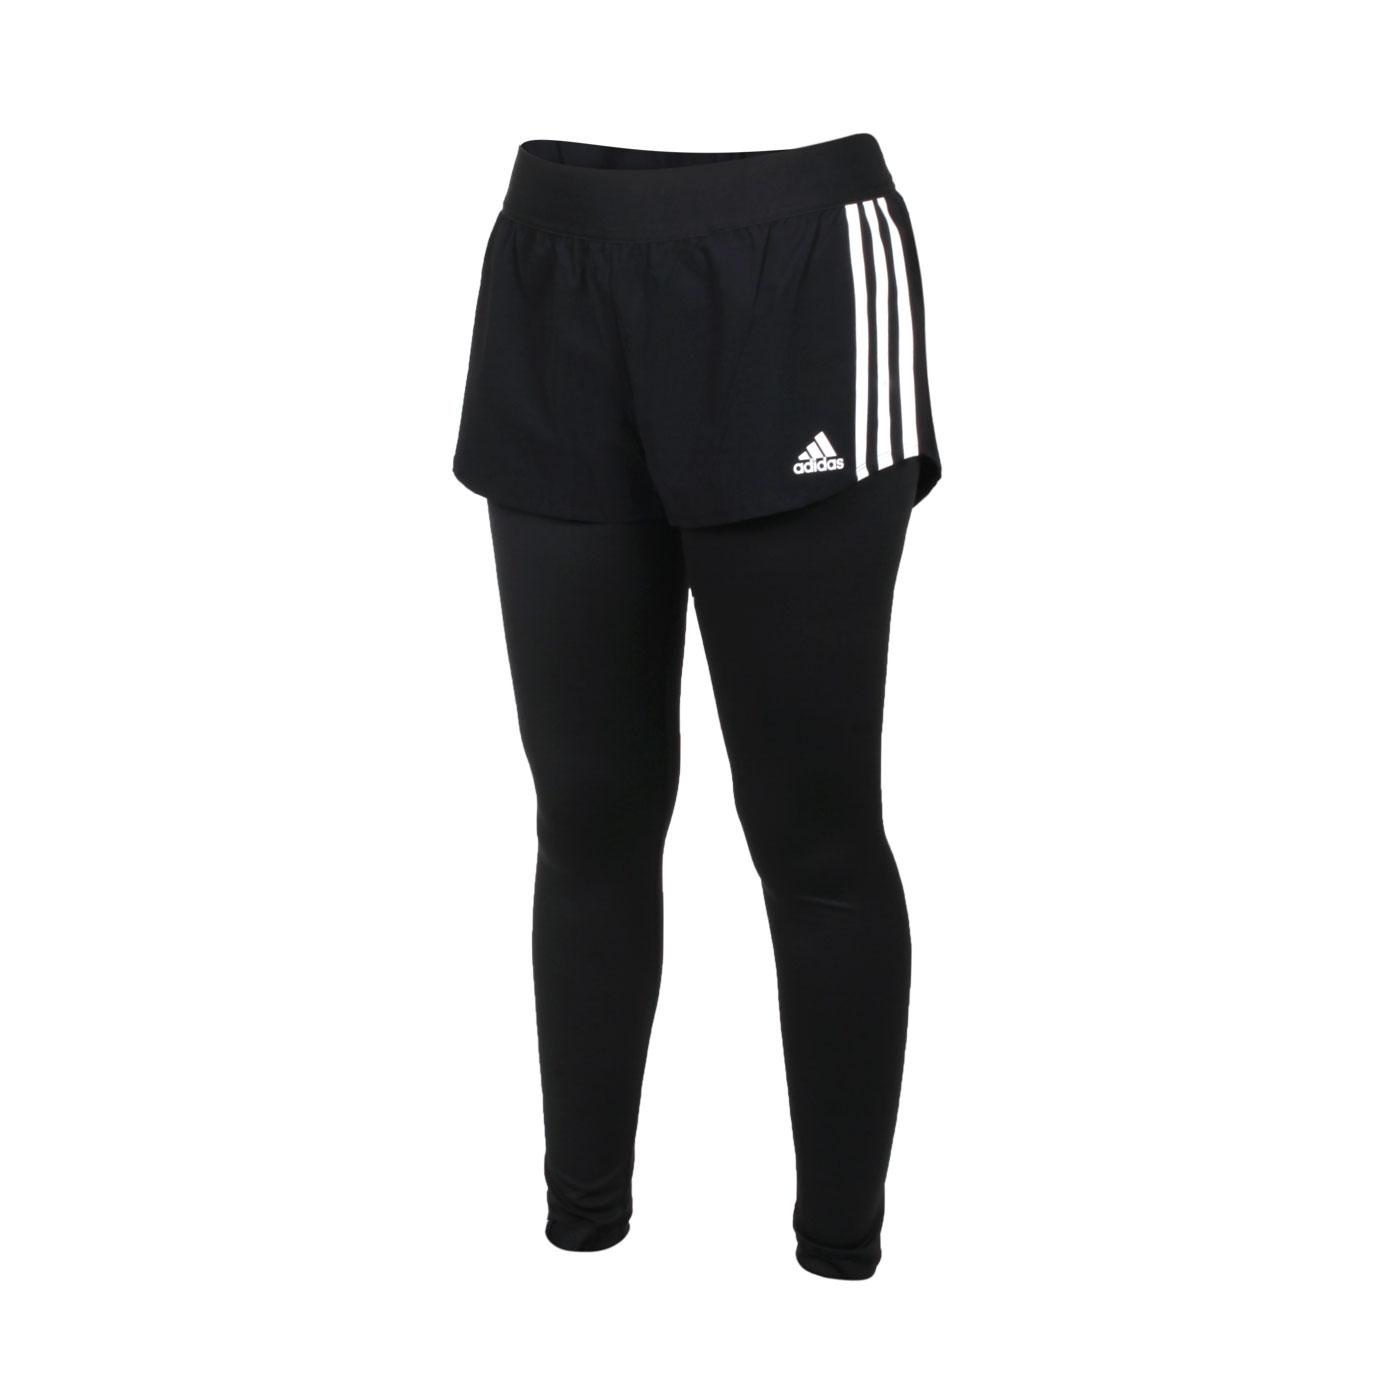 ADIDAS 女款緊身長褲 GM5024 - 黑白